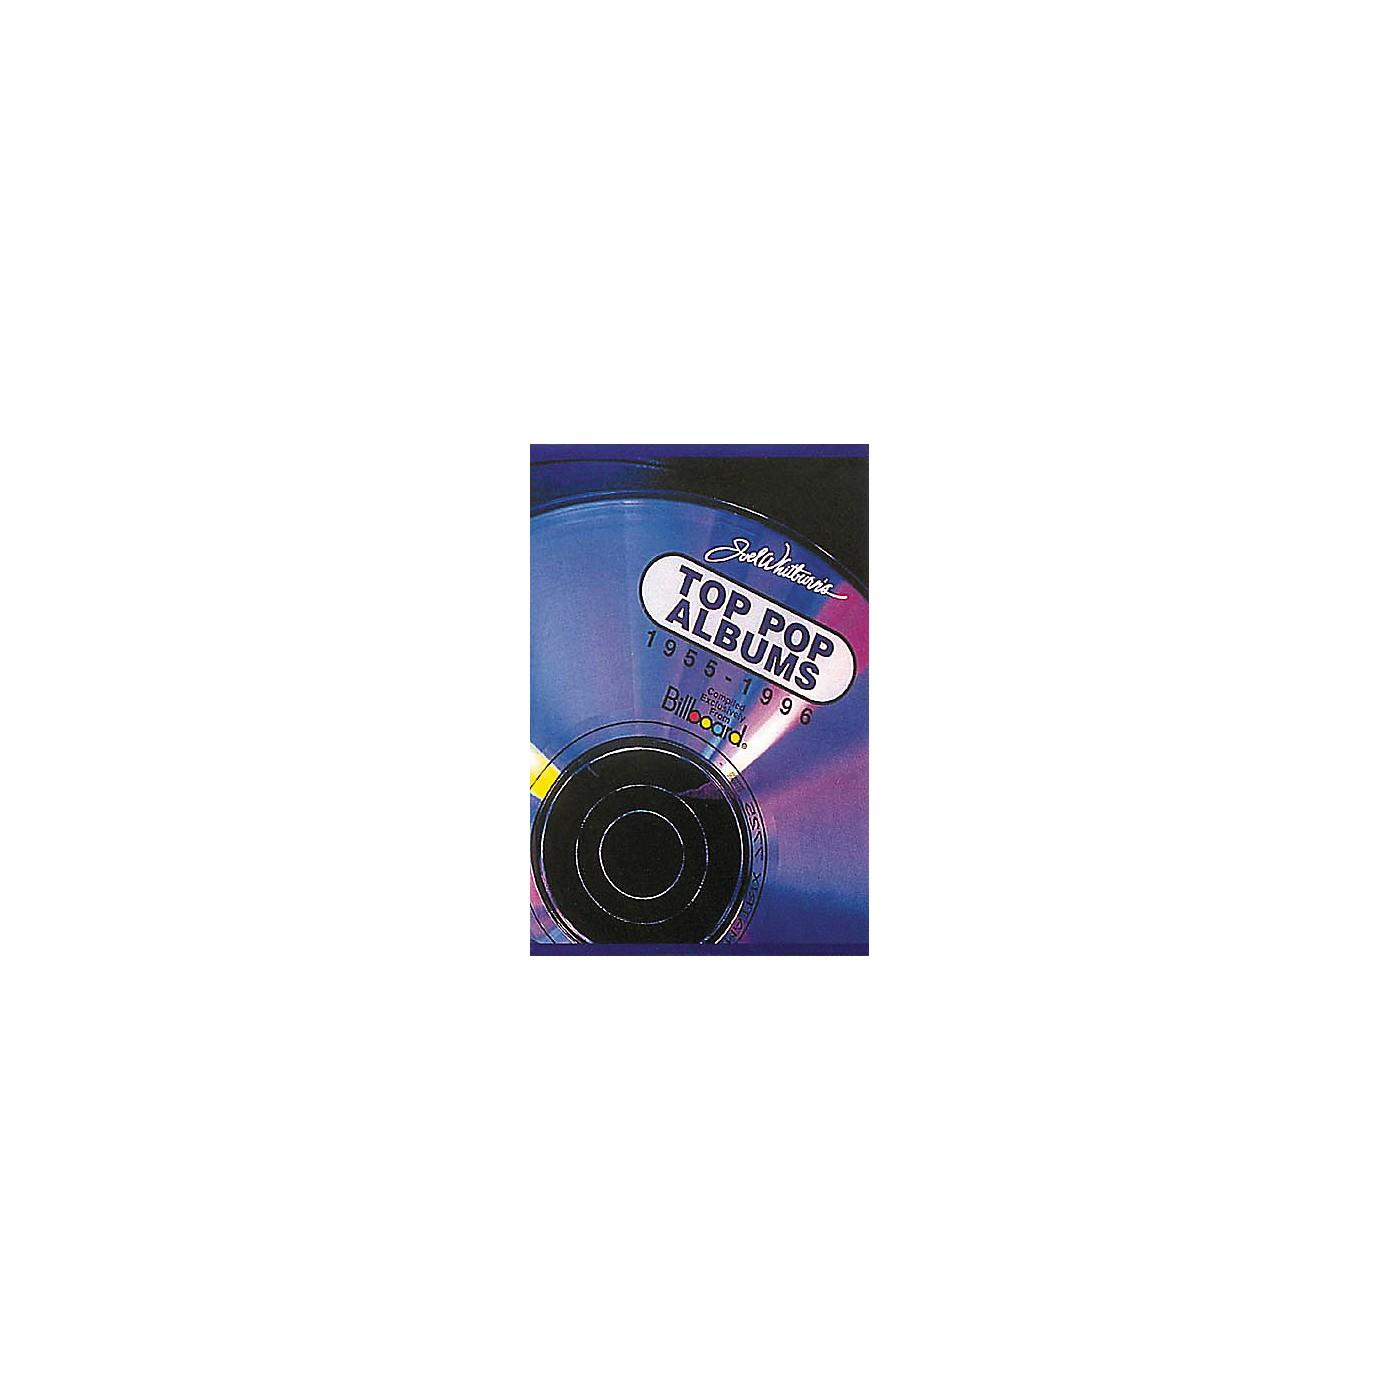 Hal Leonard Top Pop Albums 1955-1996 Hardcover Book thumbnail